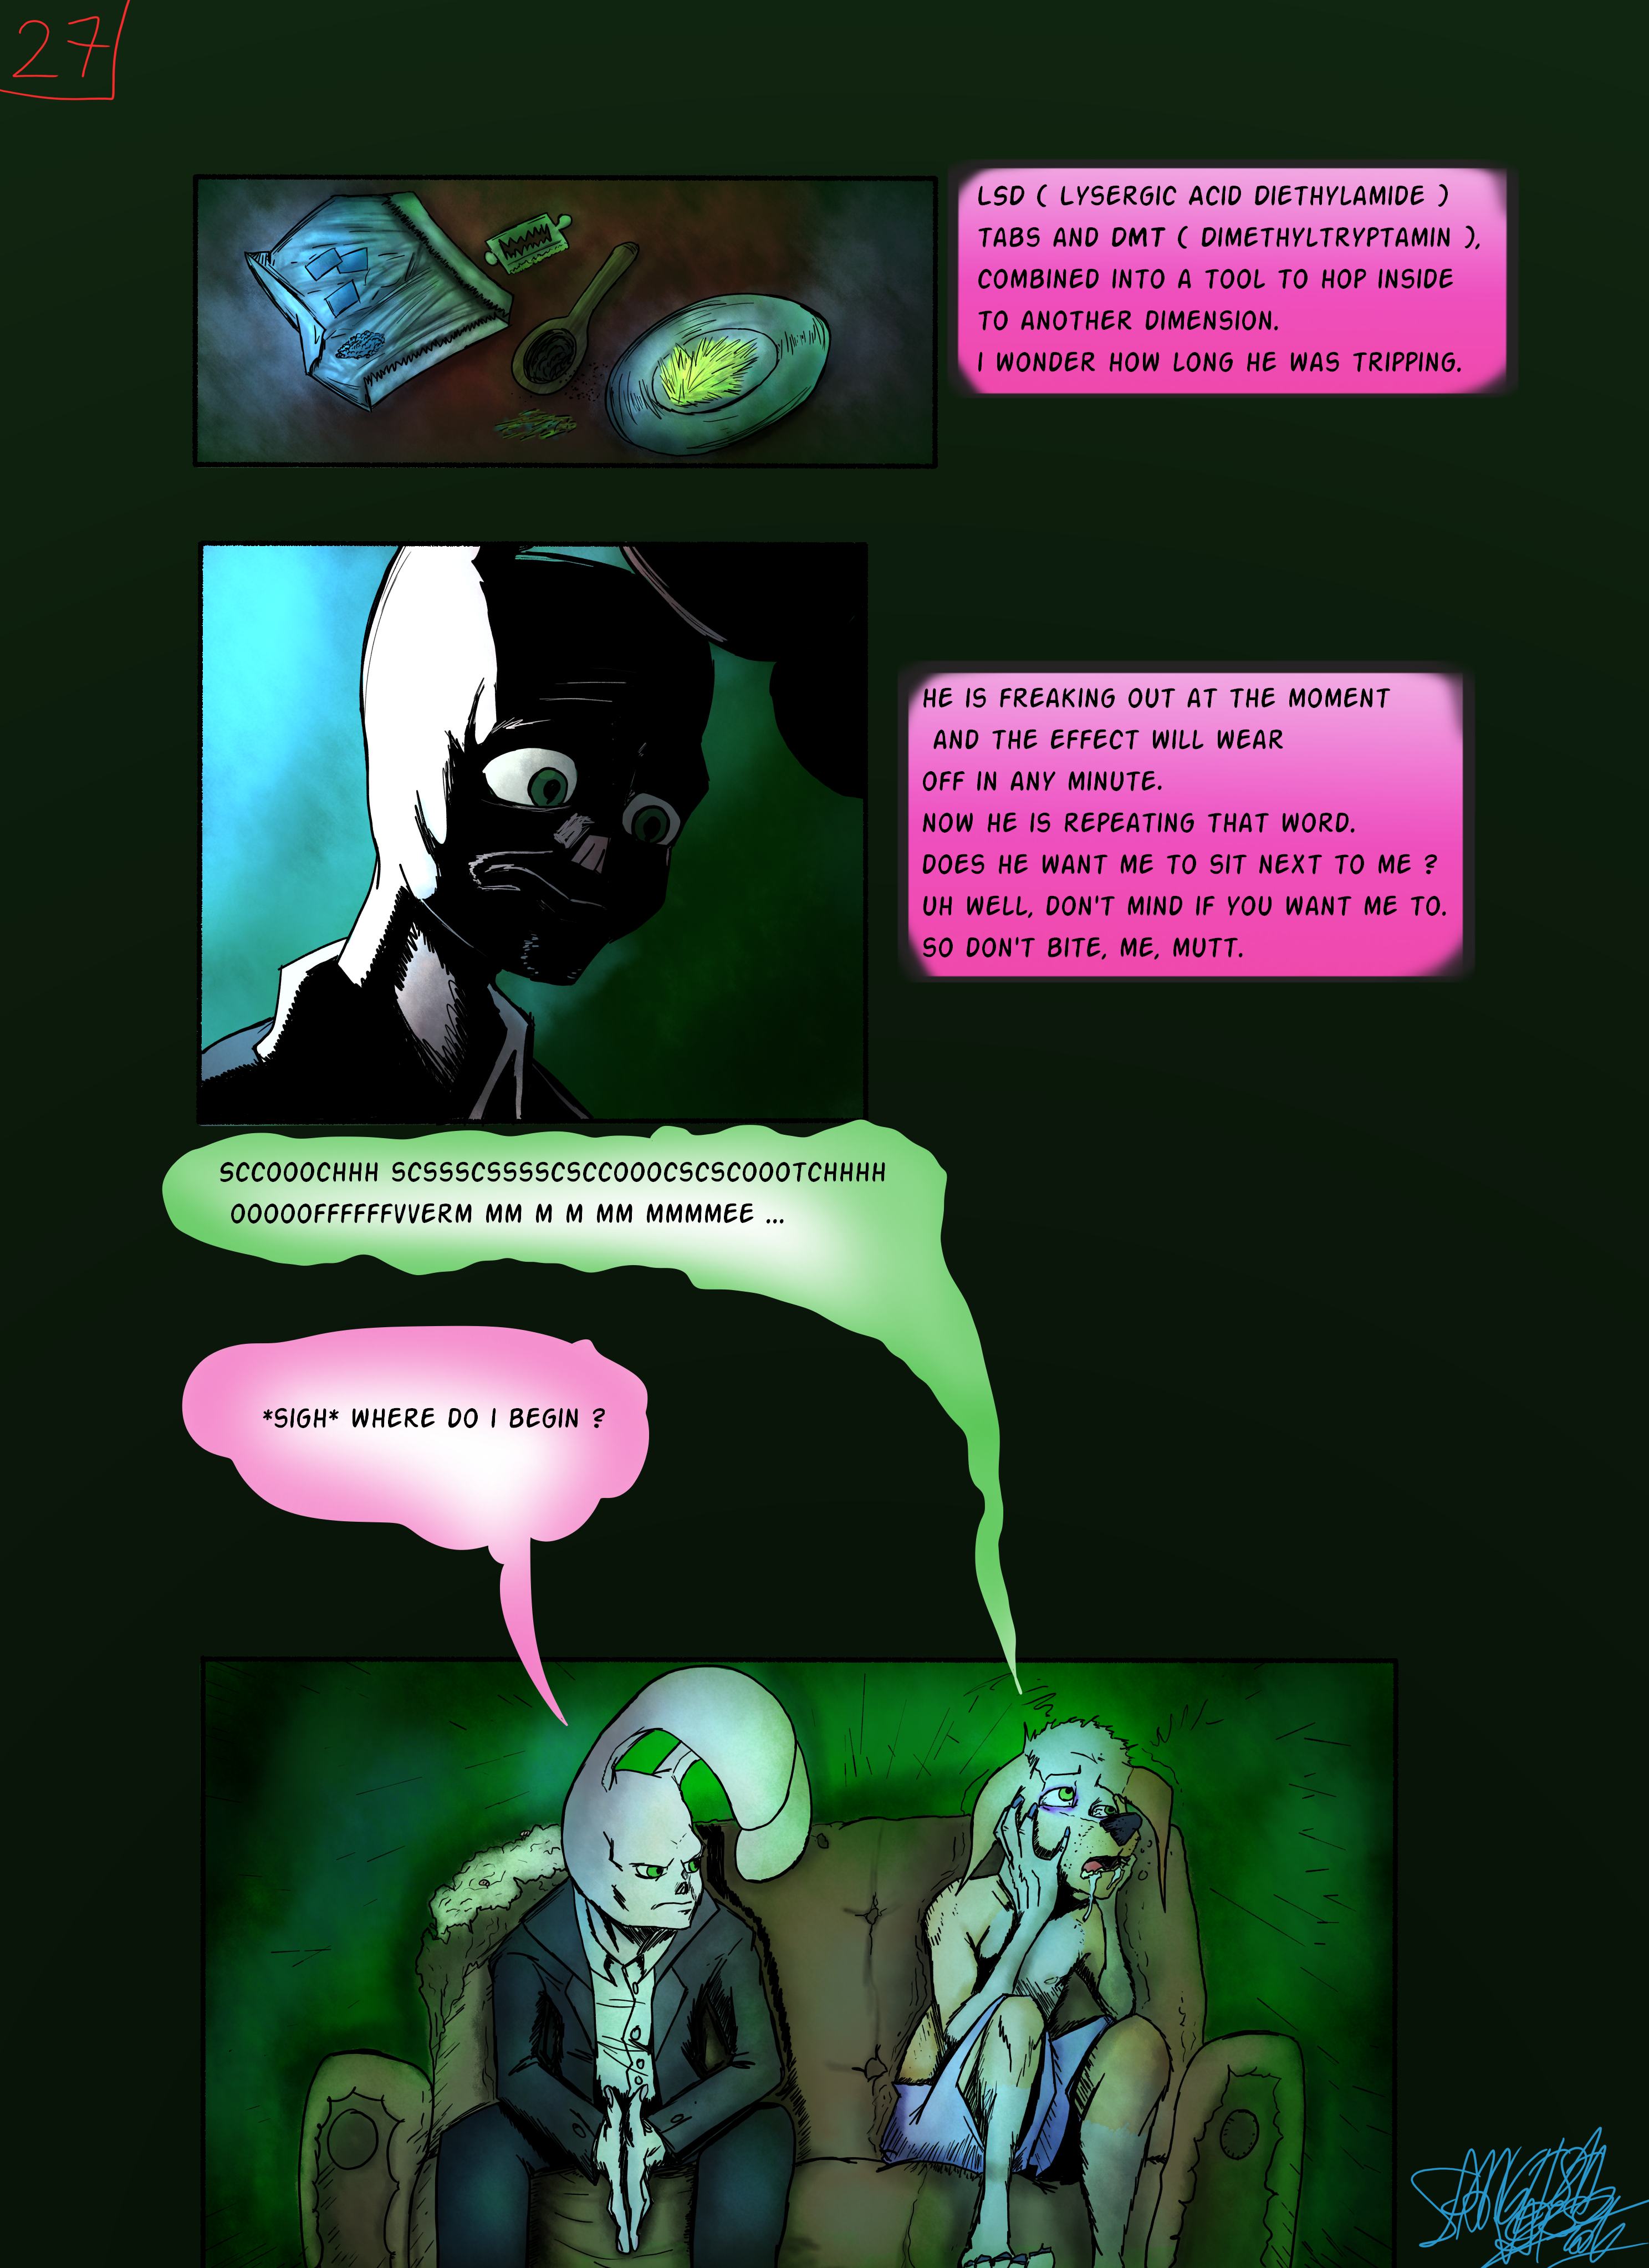 Bob the Psycho Rabbit Vs Alfred Alfer Page 27 (comic) (27/39)